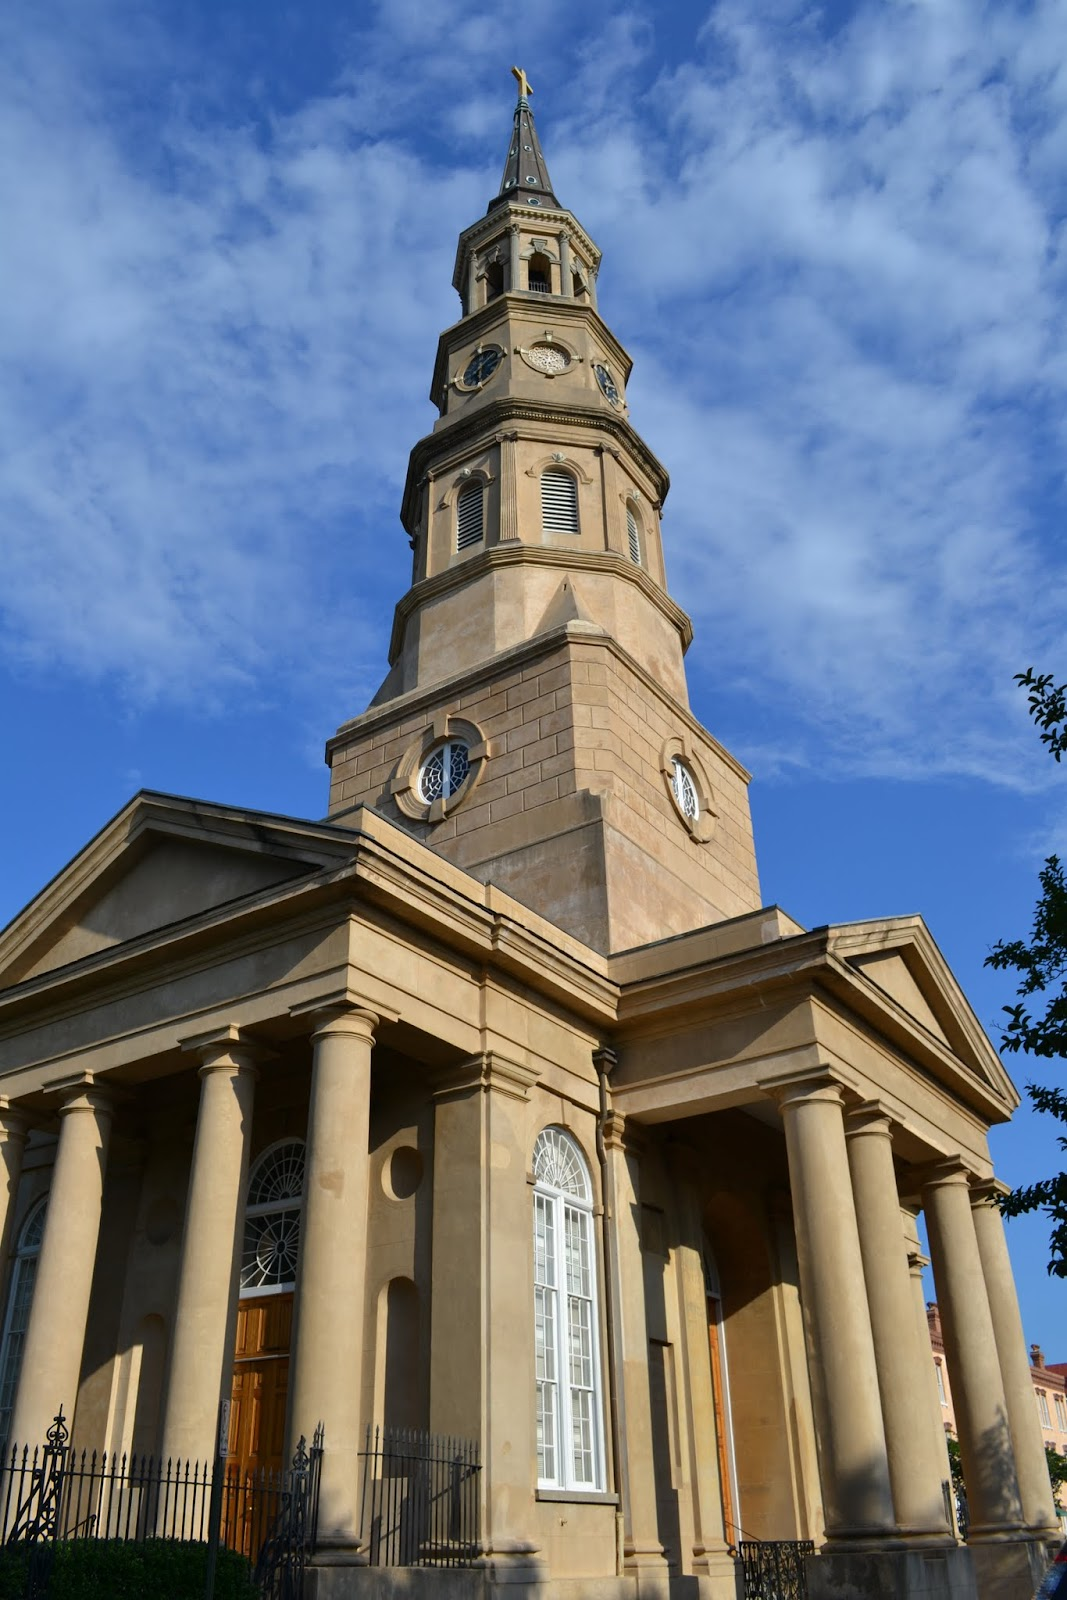 Церковь Святого Филлипа. Чарльстон, Южная Каролина (St. Philip's Church. Charleston, SC)